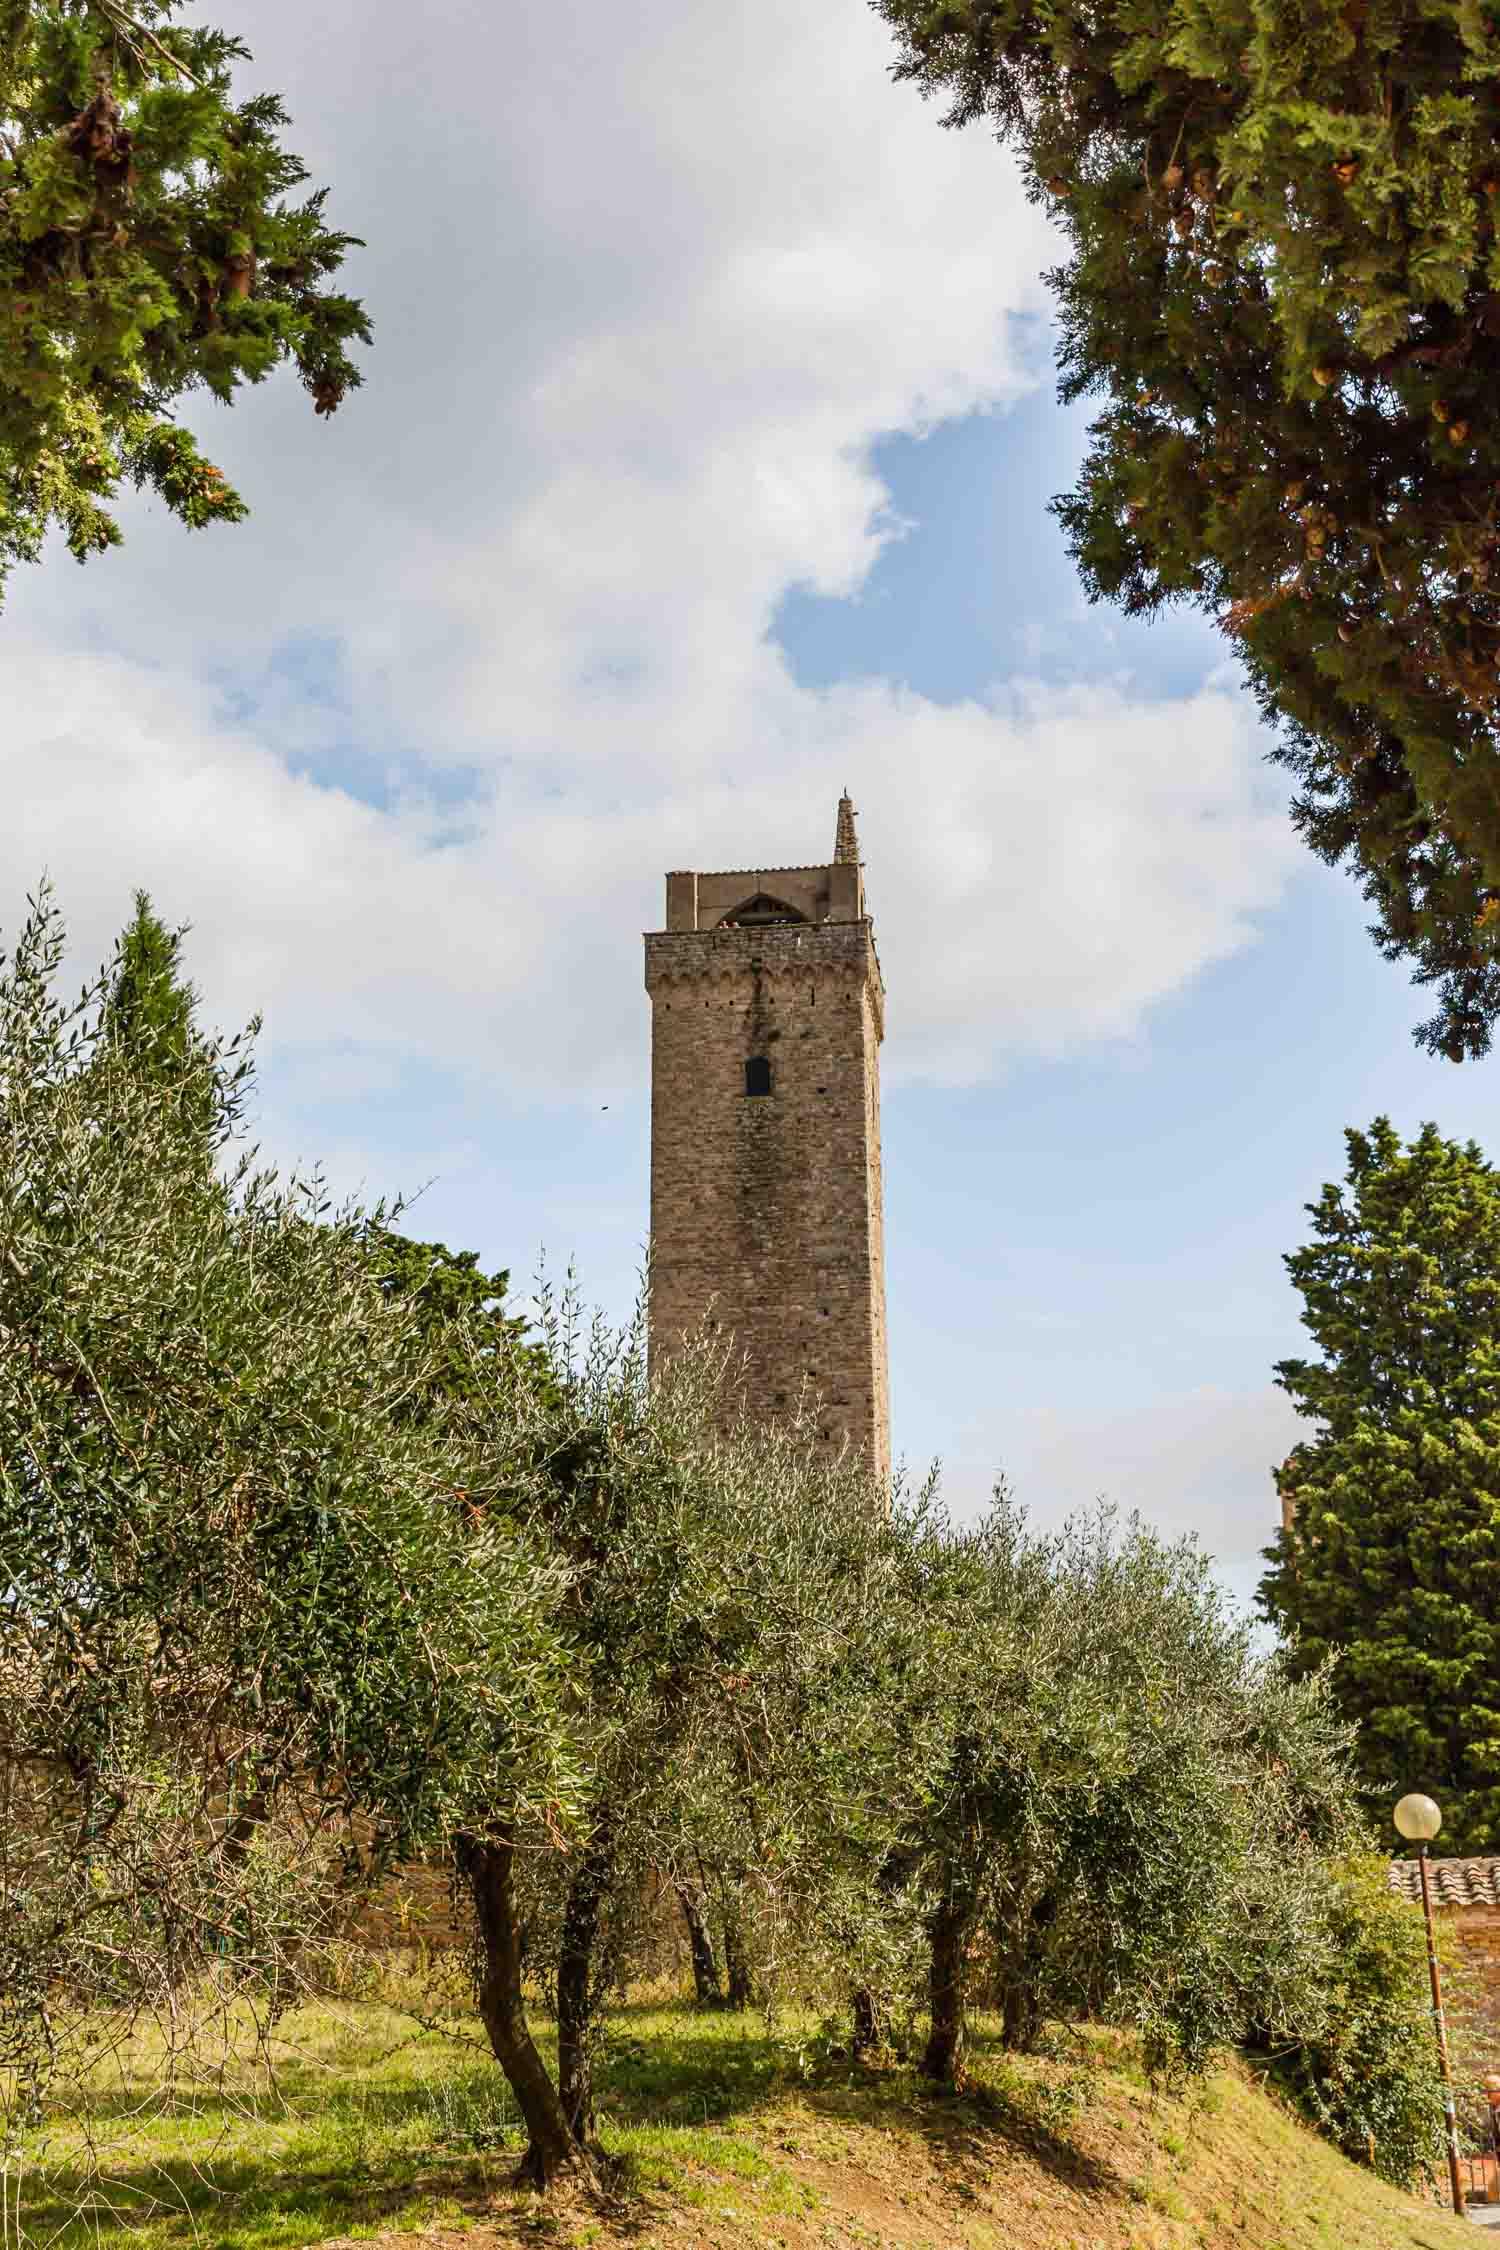 #tuscany #travel #italy #italianfarmhouse #olivegroves #sangimignanotower #vineyards #italyinautumn #veganrestaurant #vegantravel #italytravel #veganitaly #vegantuscany #veganhotel #ecotourism #tower #veganhotel #veganretreat #veganbedandbreakfast #sangimignano